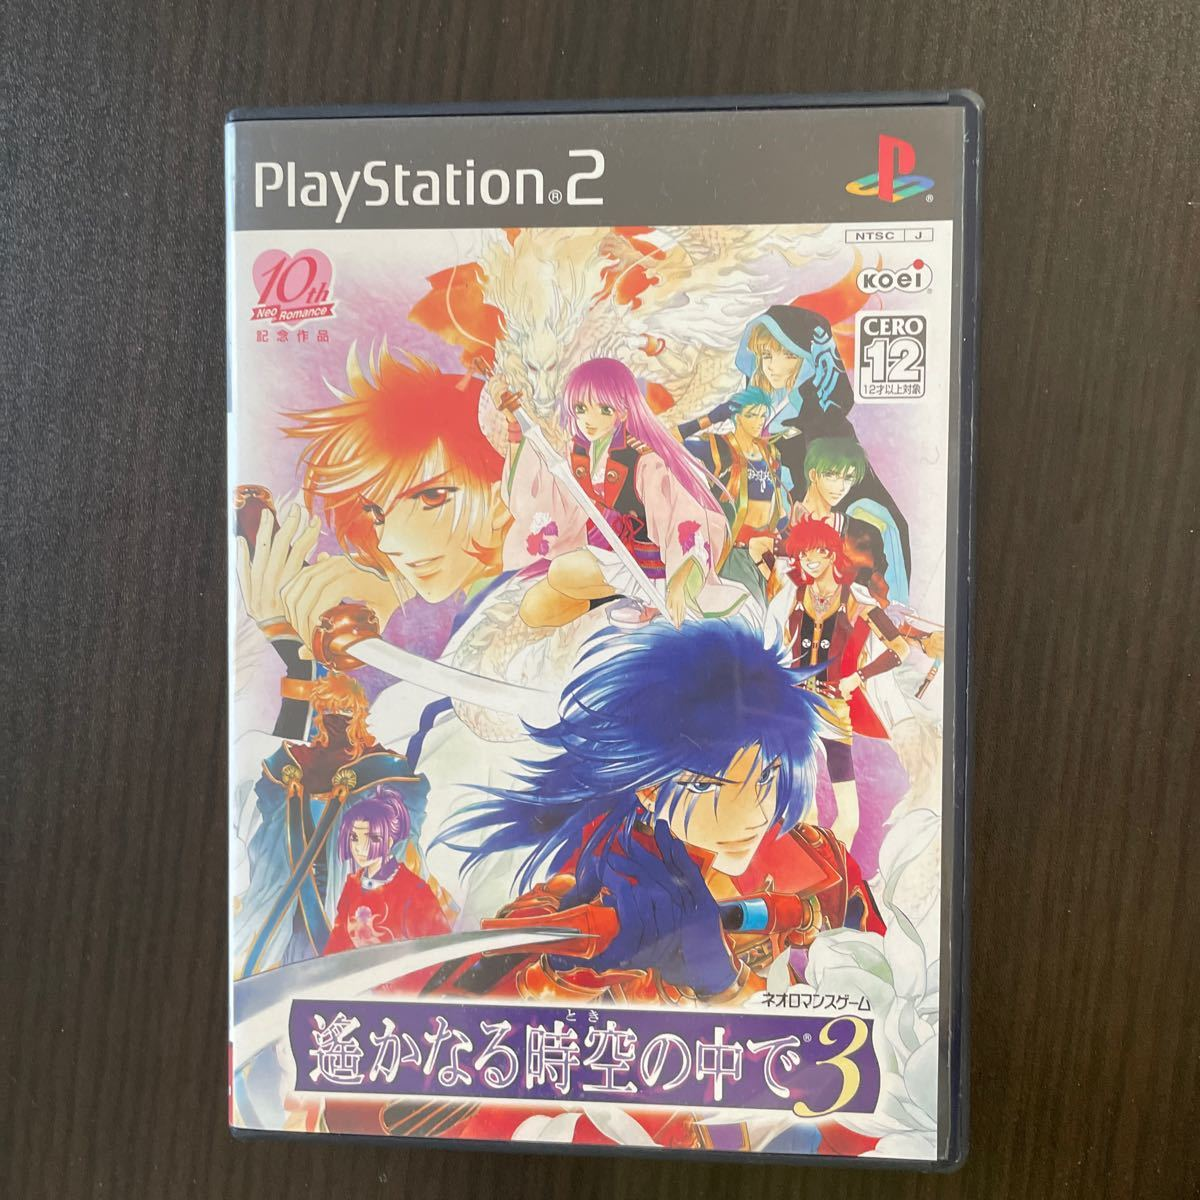 PlayStation2 遥かなる時空の中で3  プレイステーション2 PS2ソフト